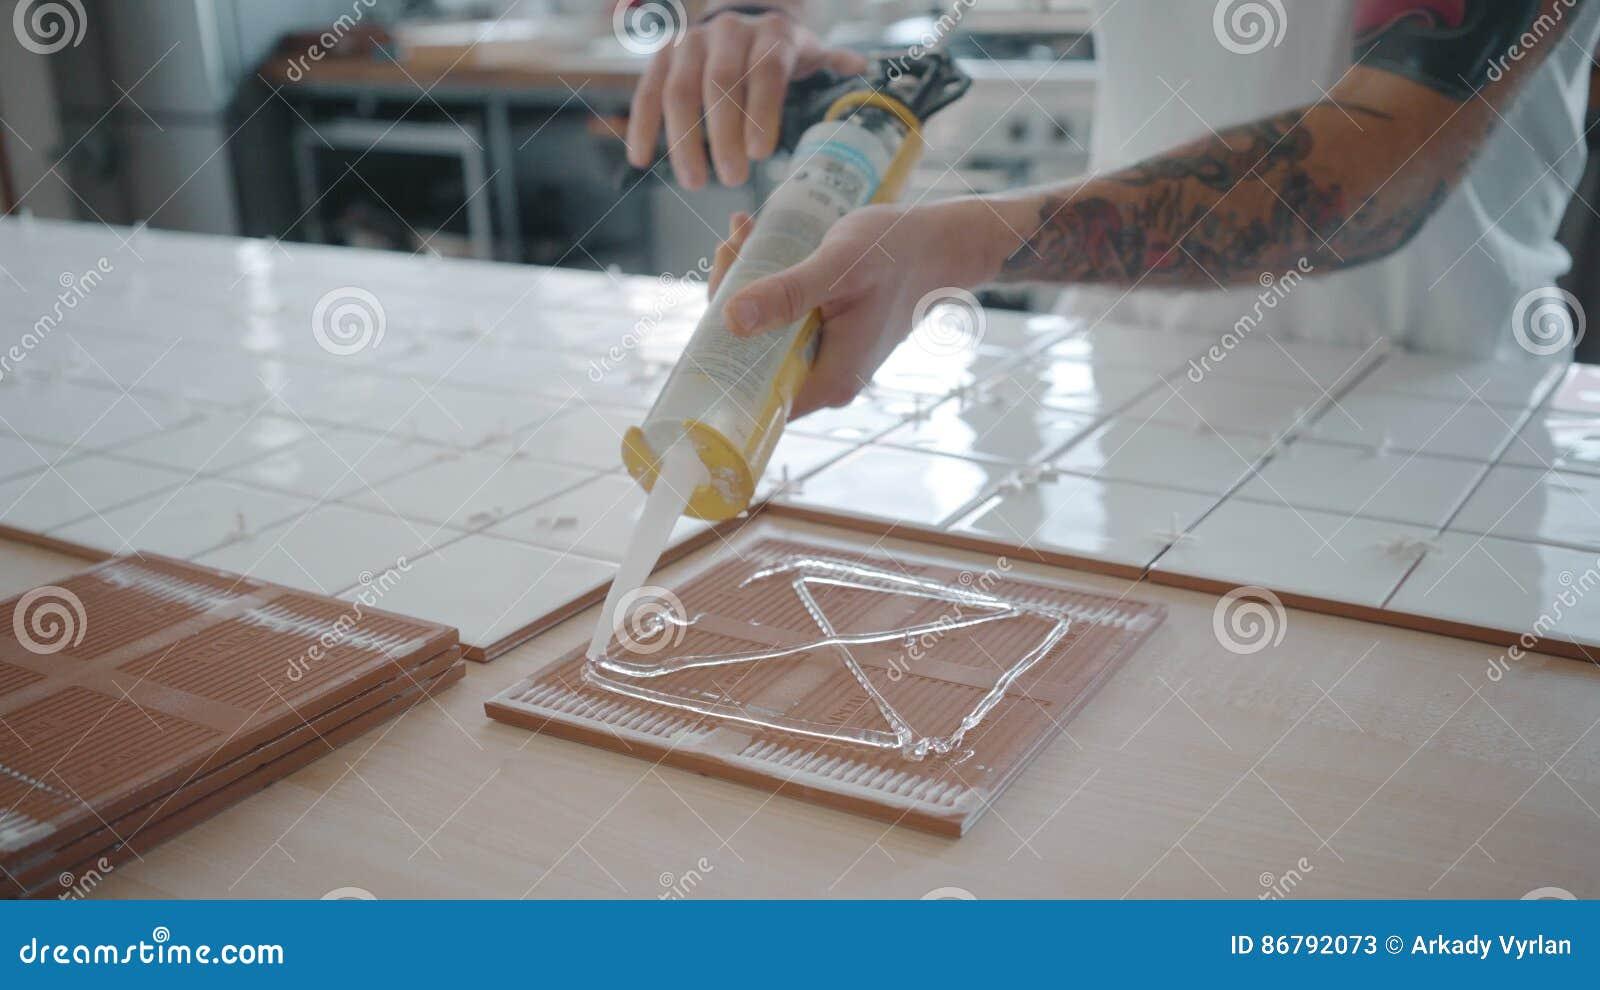 Tattooed Man Applies Ceramic Tiles On Kitchen Table Set Stock Video